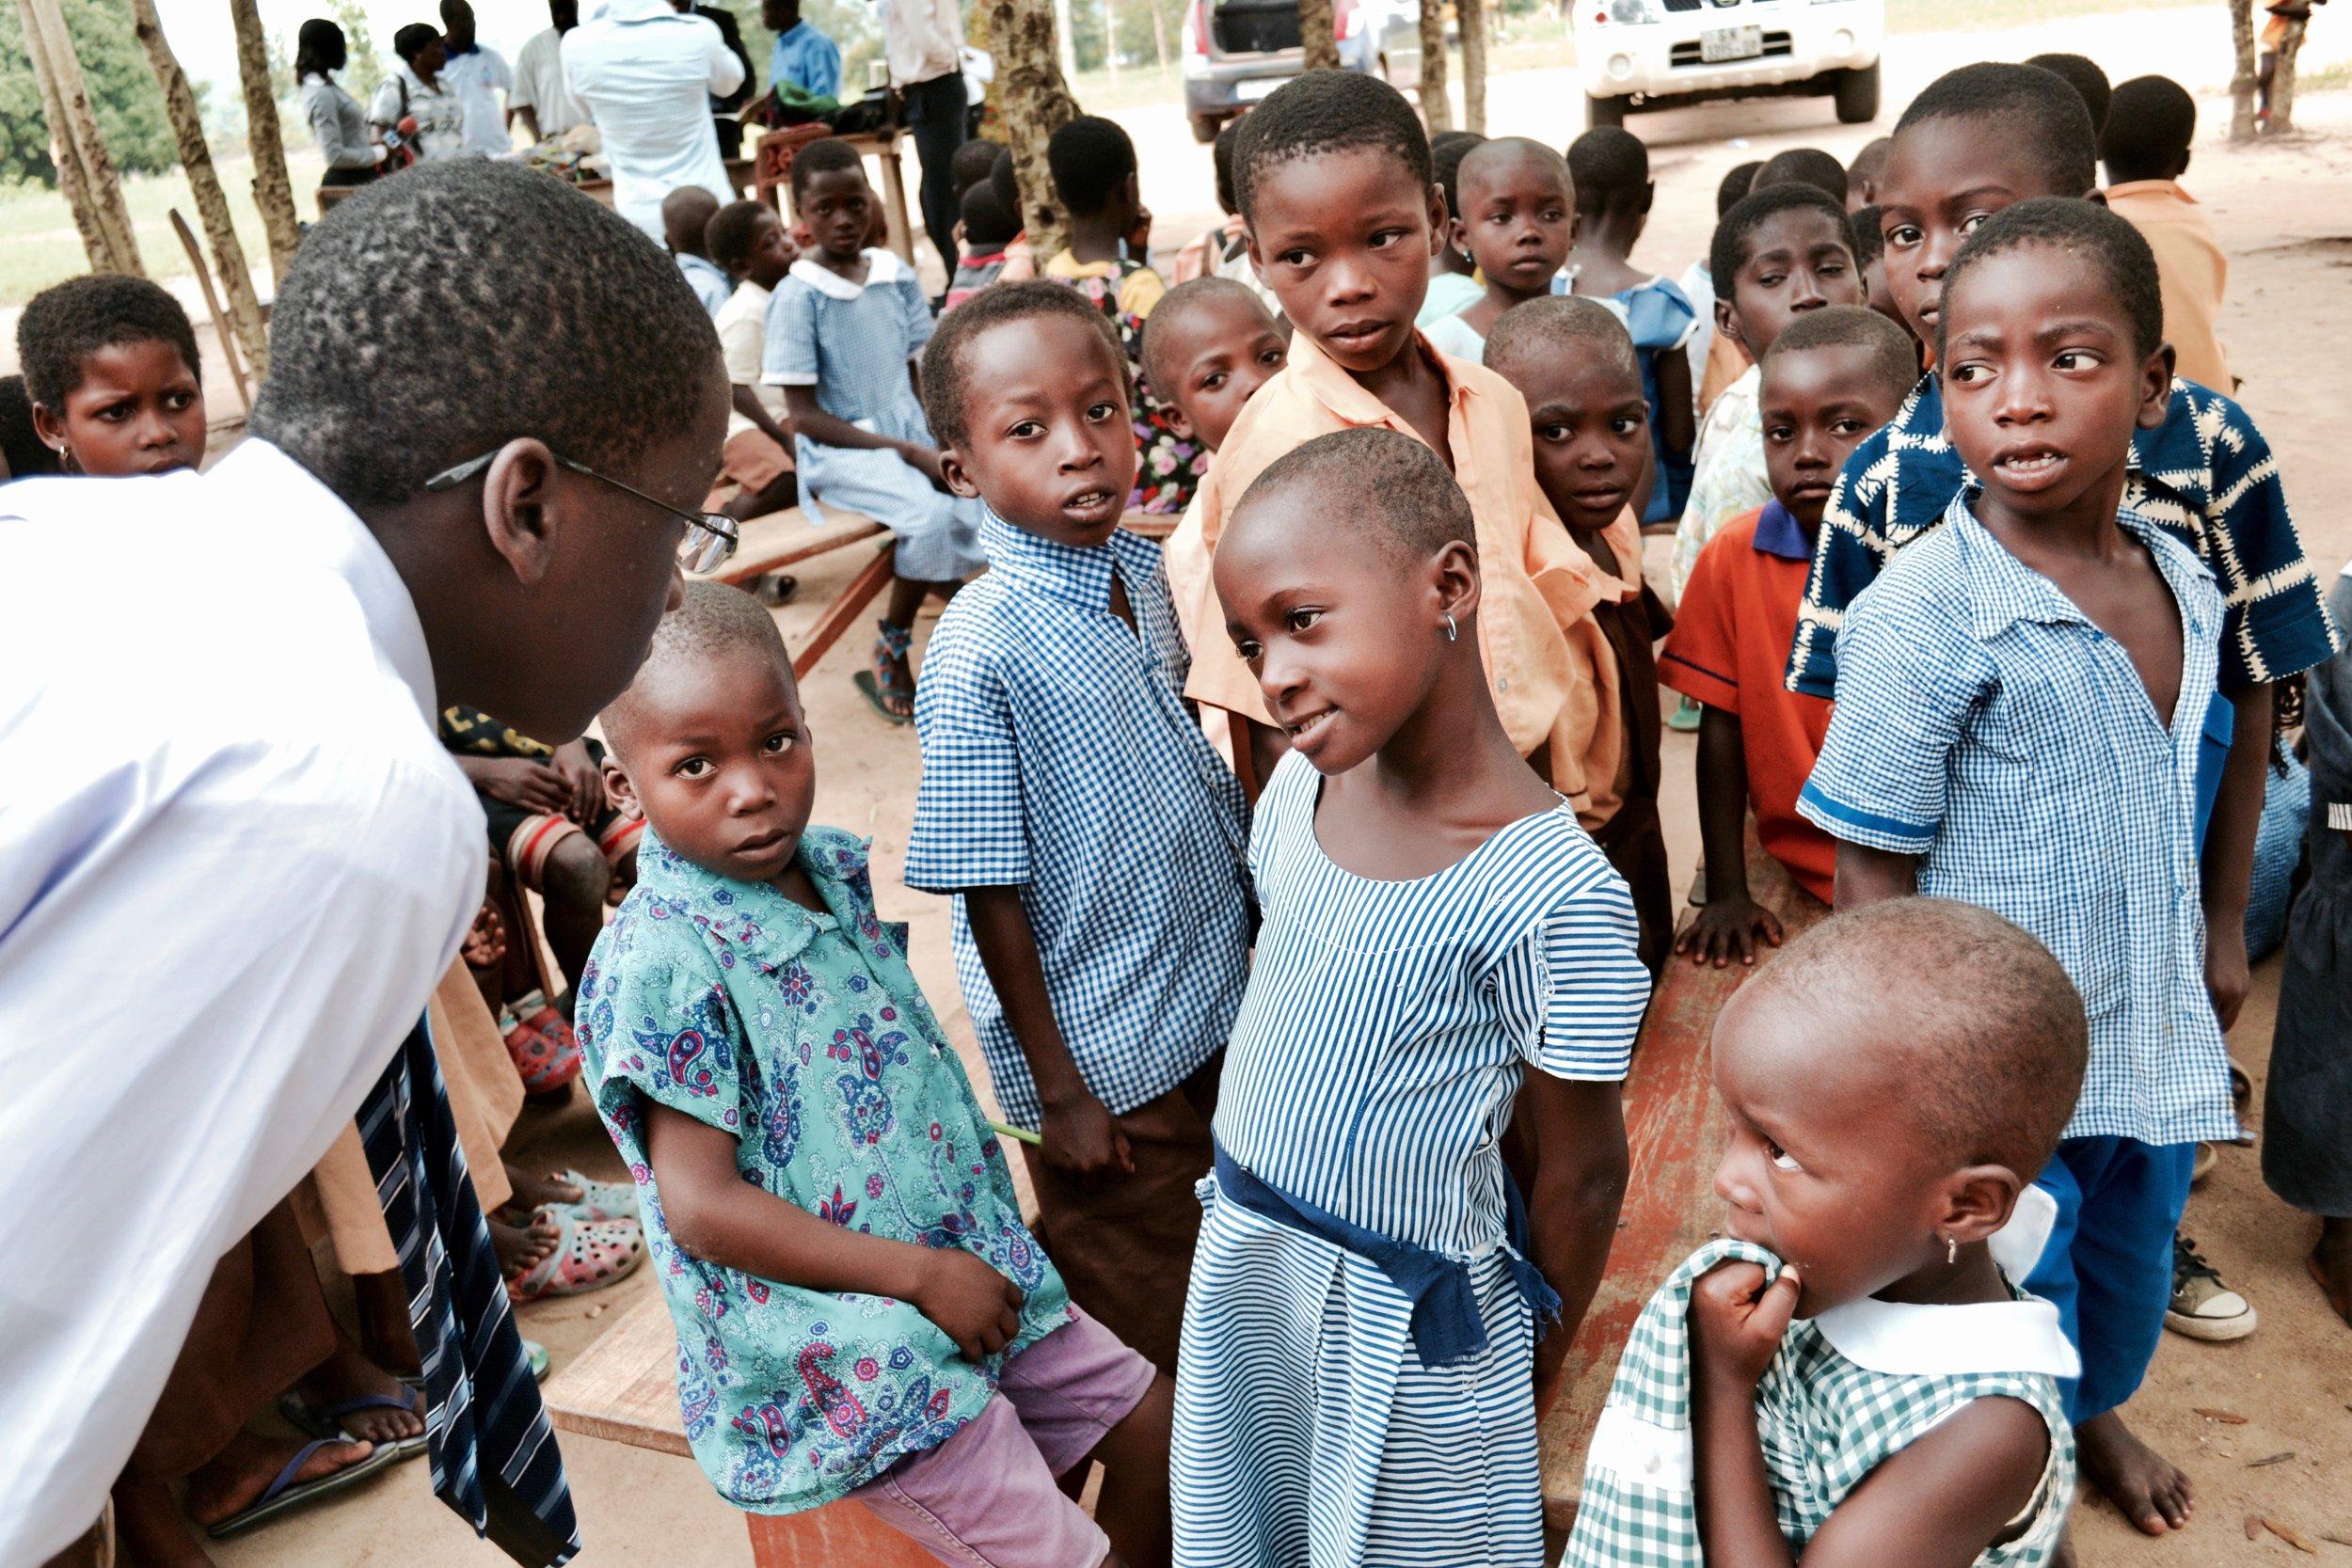 Students at Tikobo II Elementary School